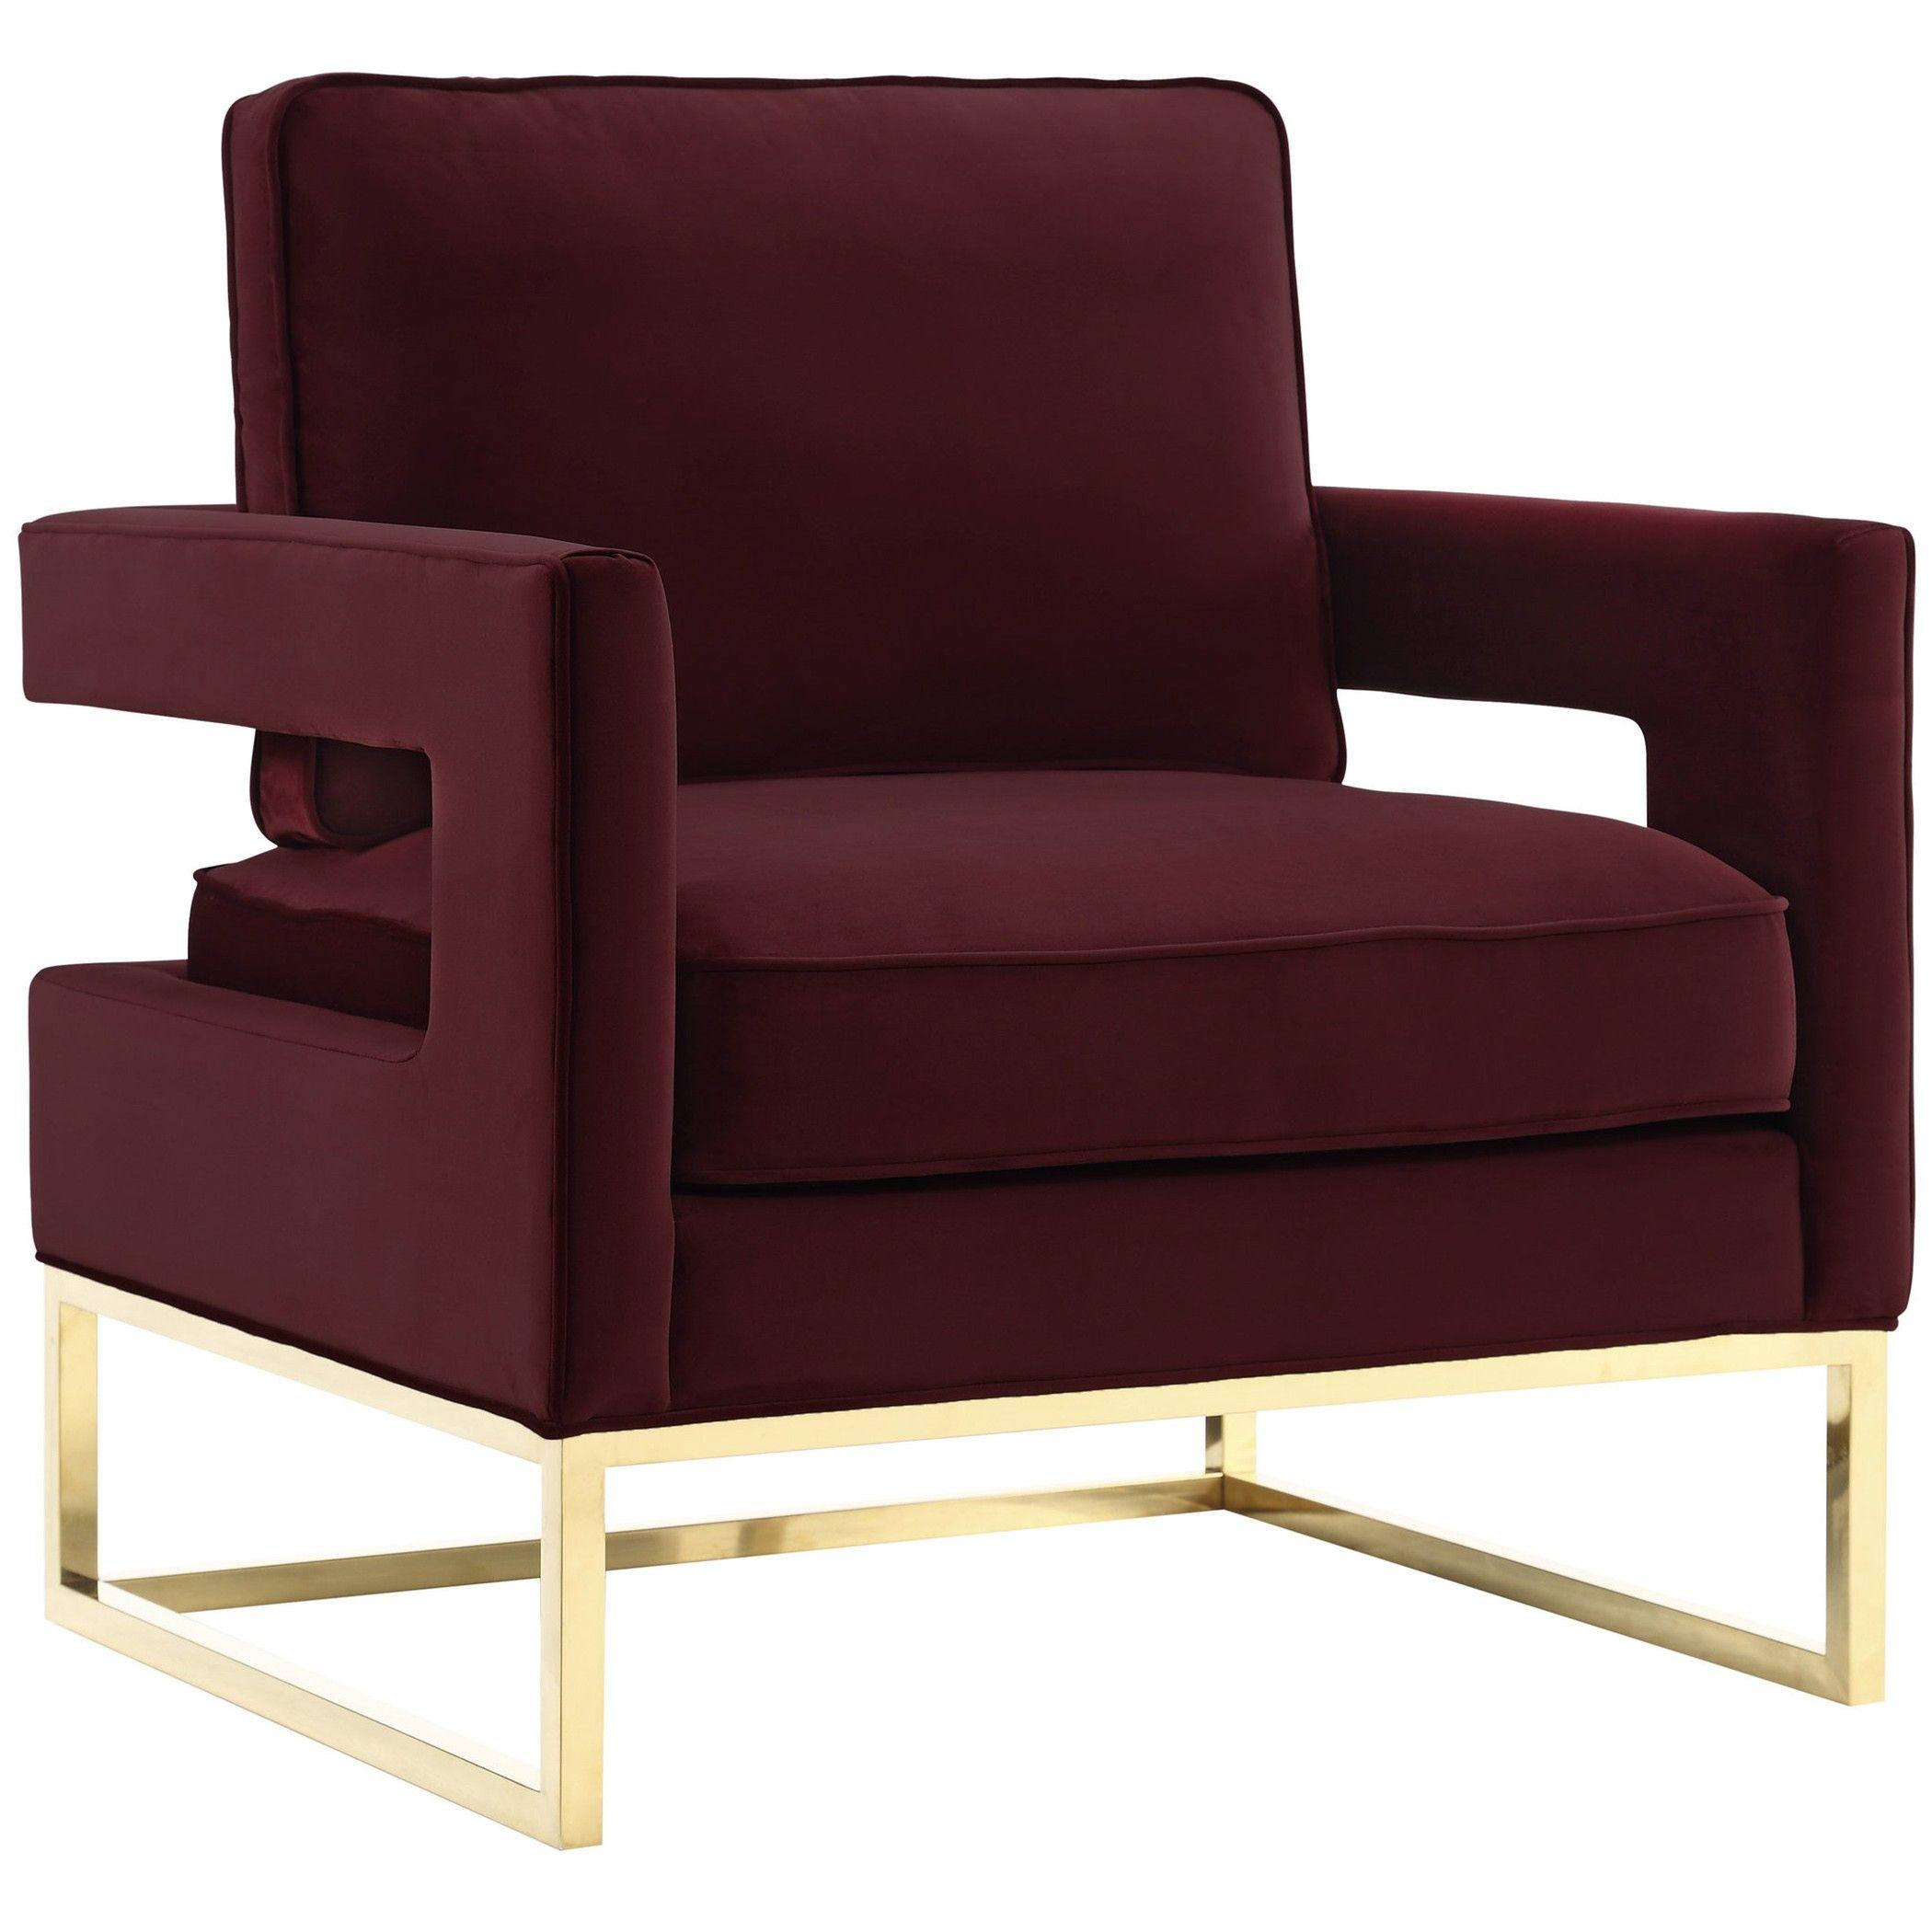 Velvet Armchair, Accent Chairs, Chair